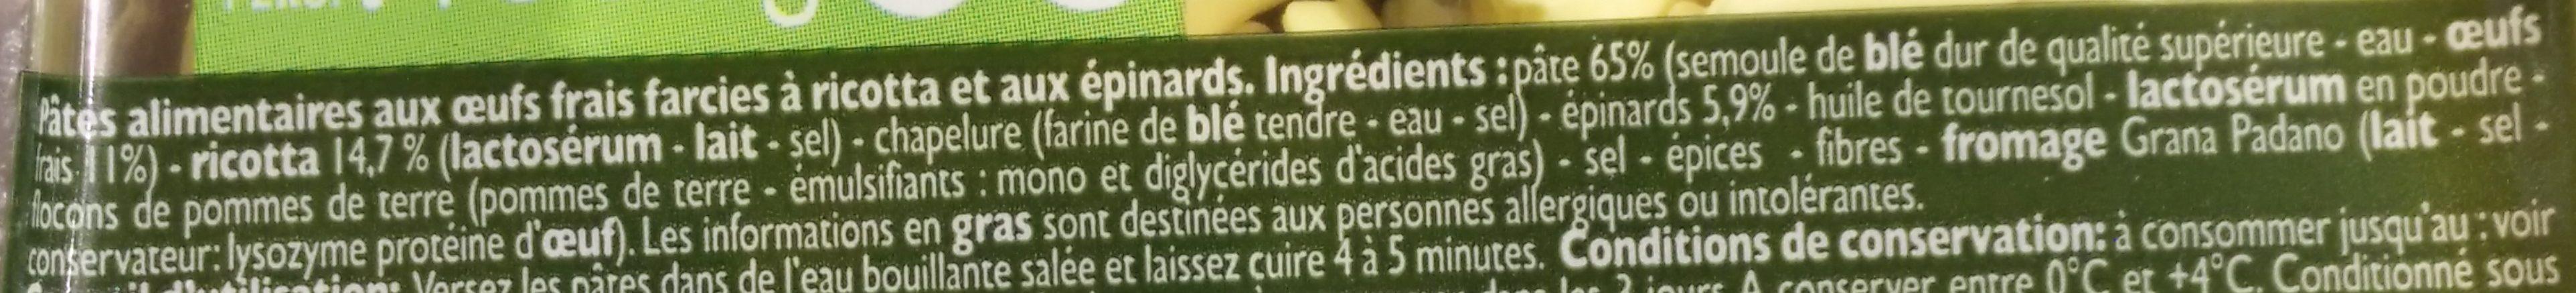 Tortelloni ricotta épinards - Ingredienti - fr